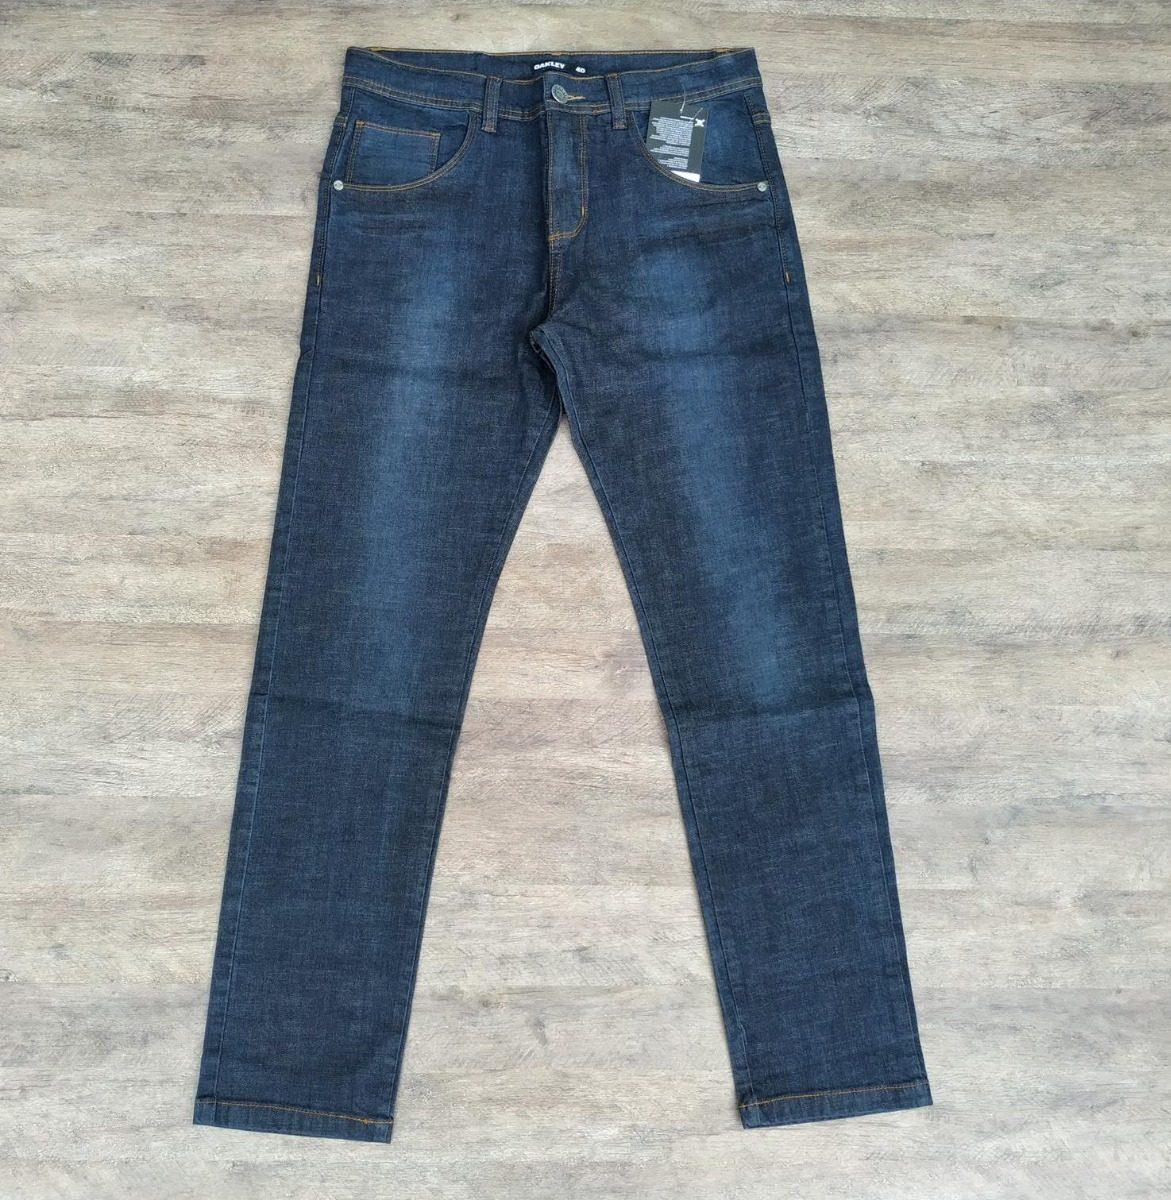 e56b26a12 Calça Jeans Oakley Walk Mod Masculina Especial - R$ 139,99 em ...